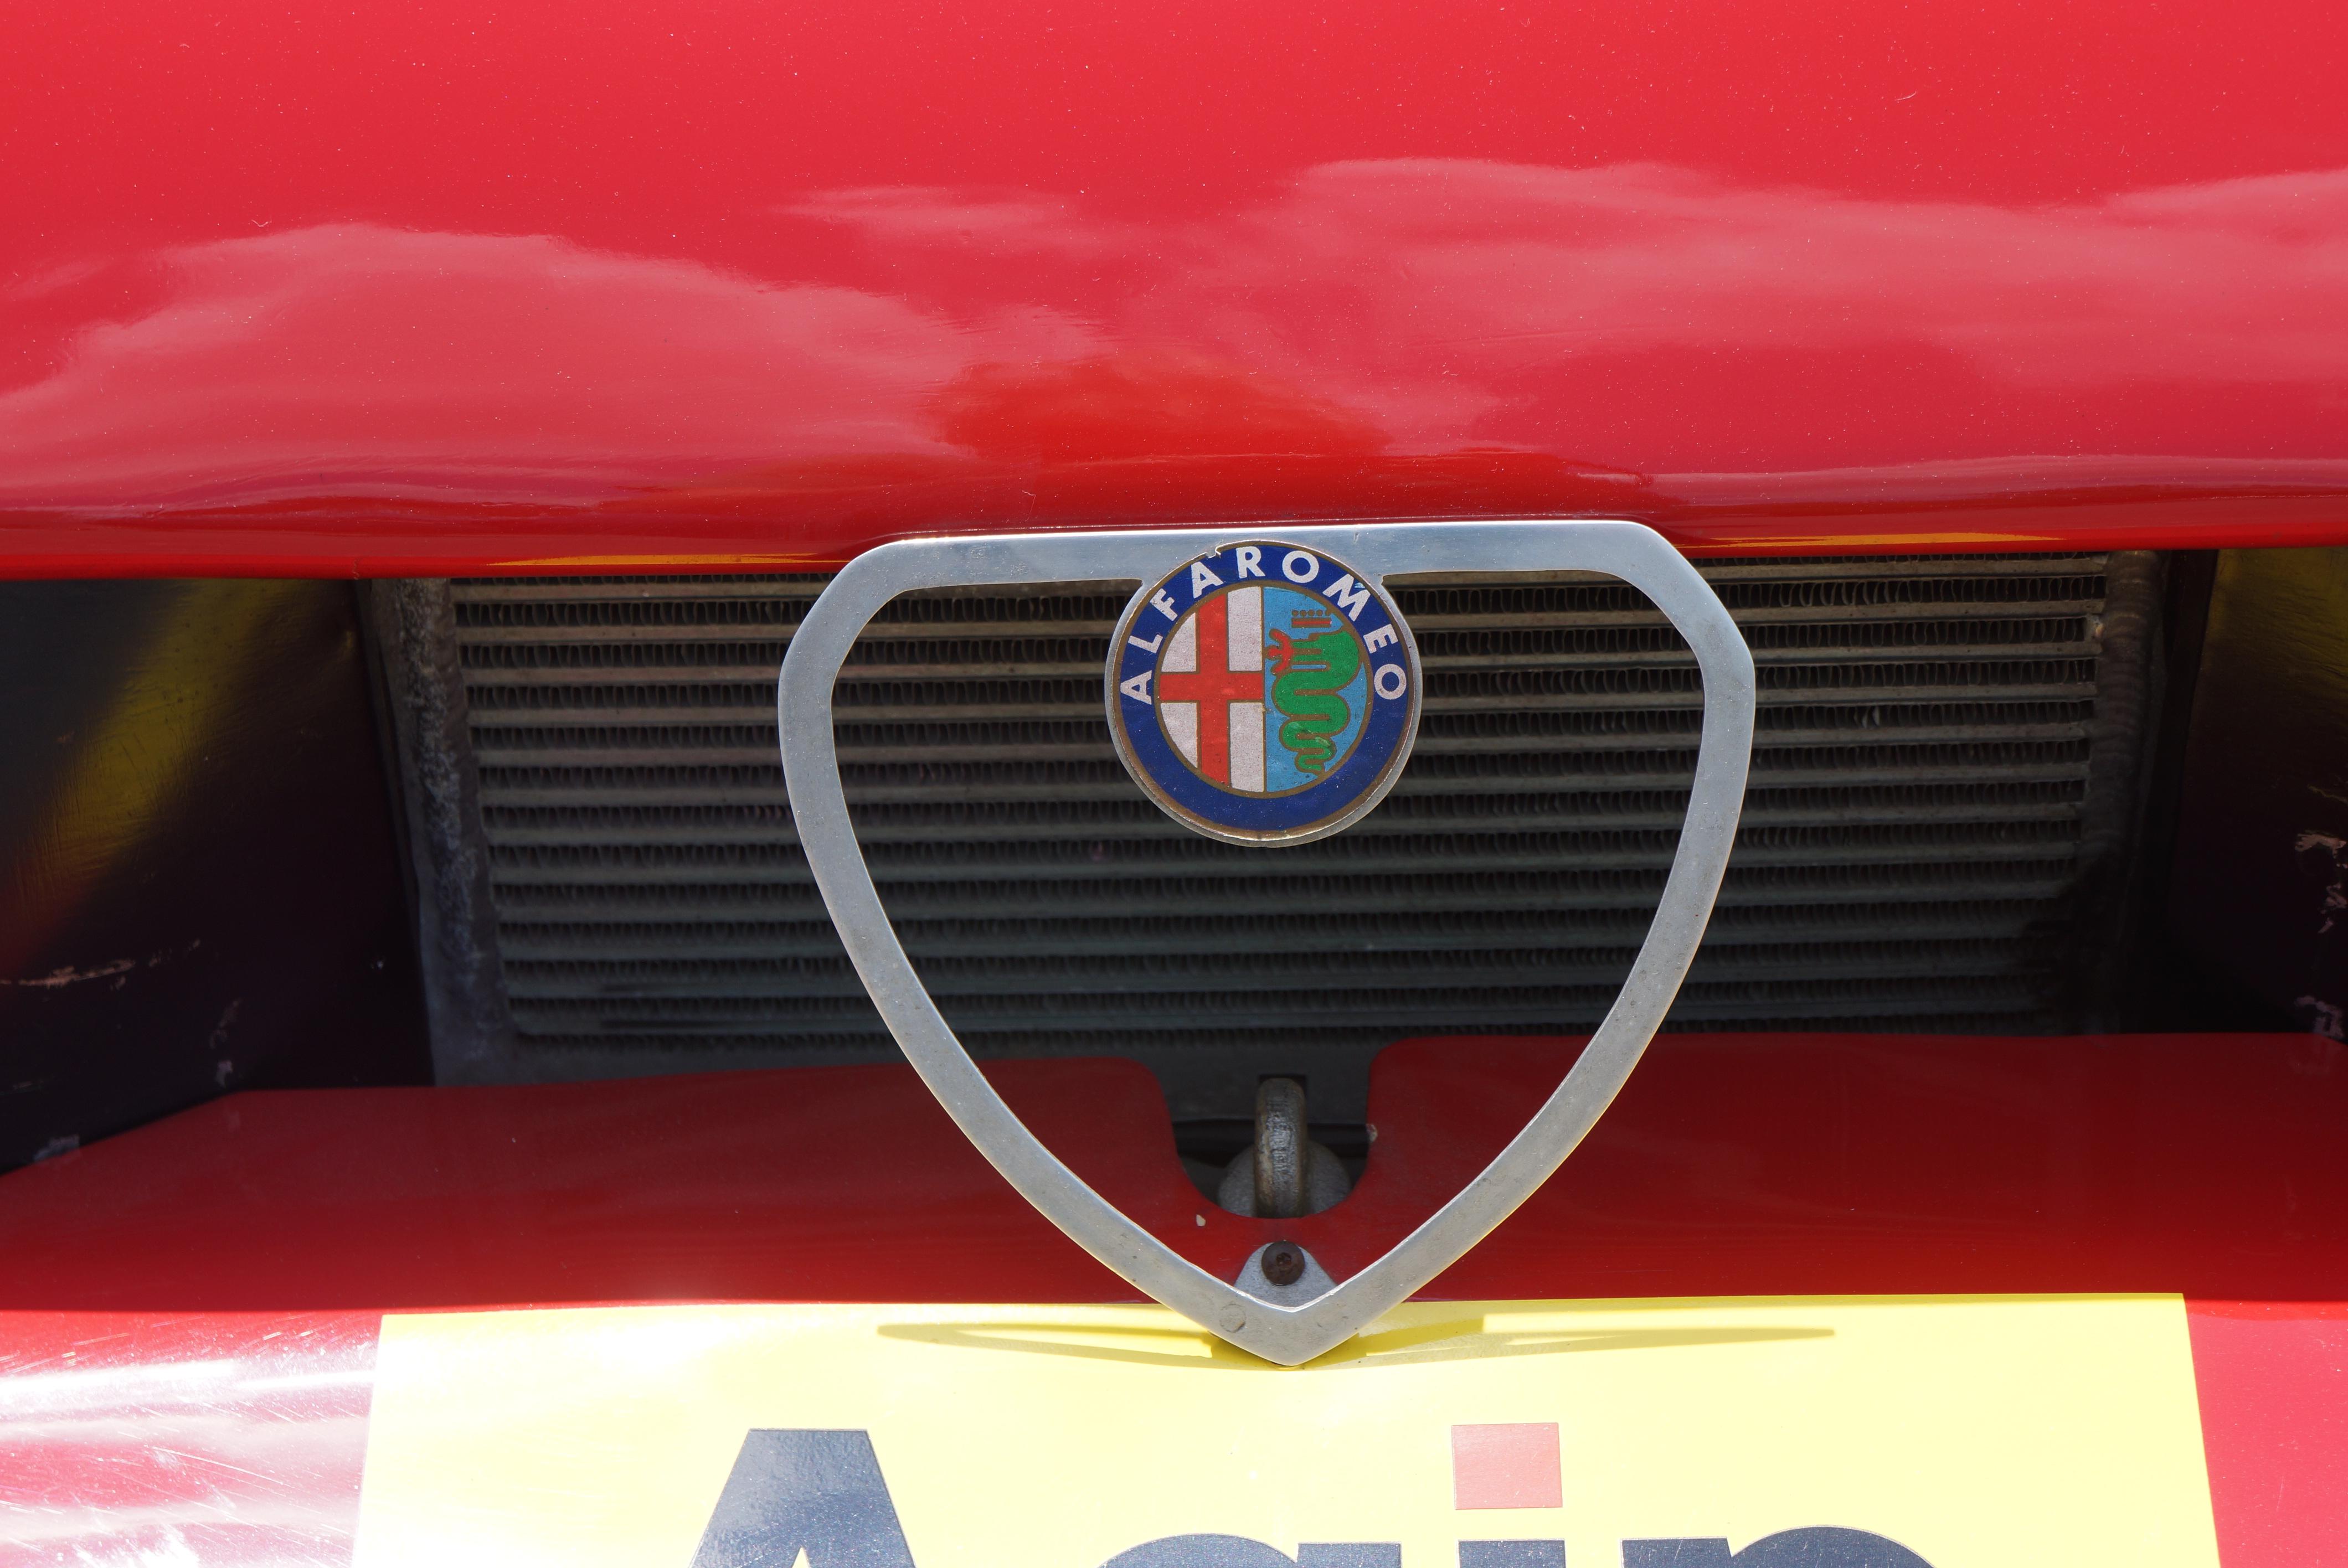 Same Alfa badge as found on any of their sedans